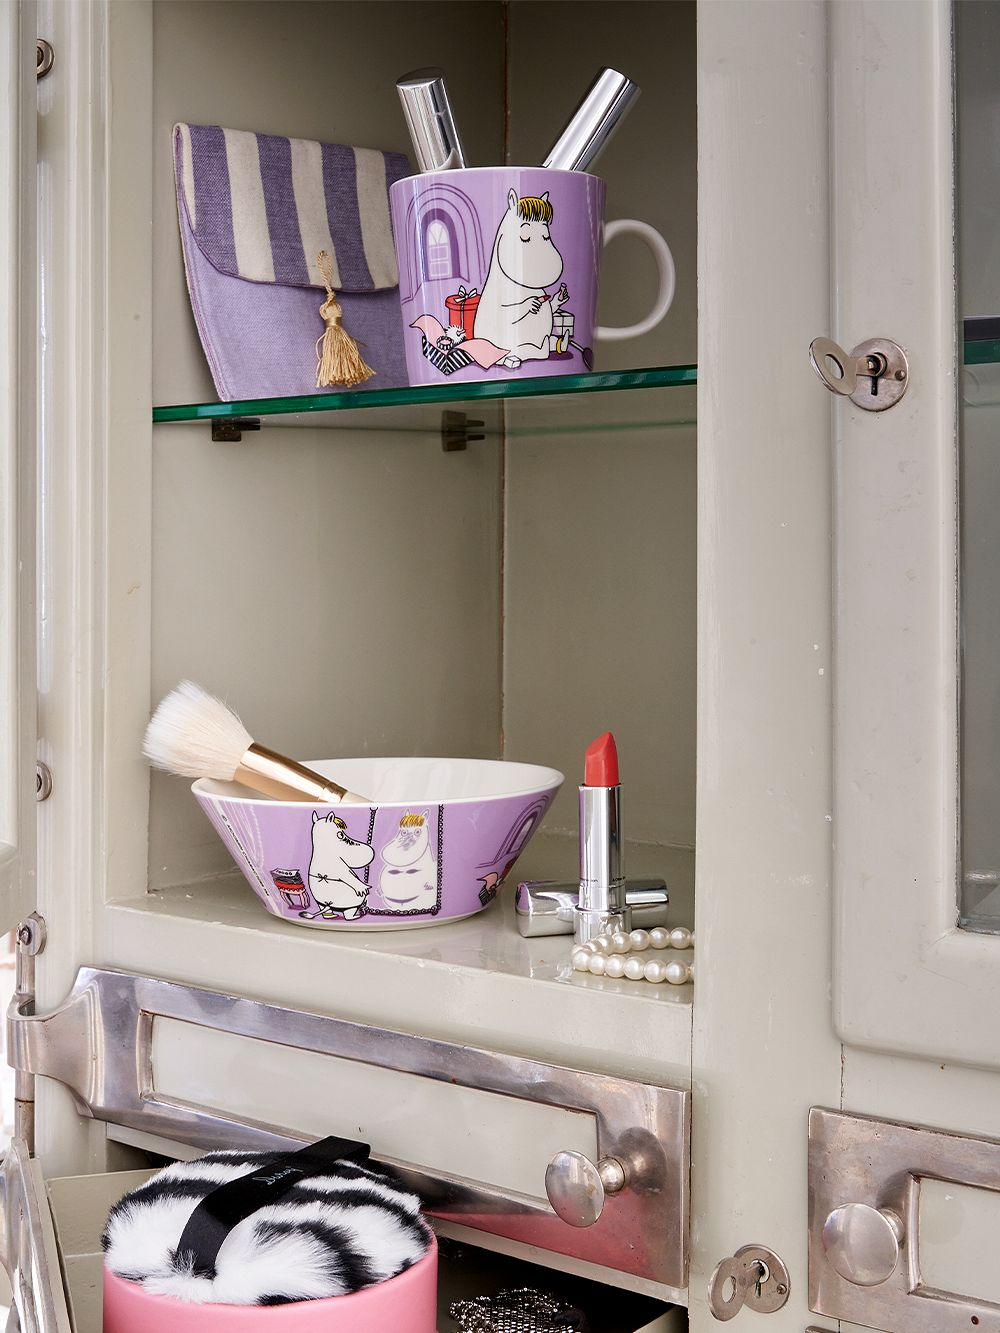 Arabia Moomin mug, Snorkmaiden, lilac